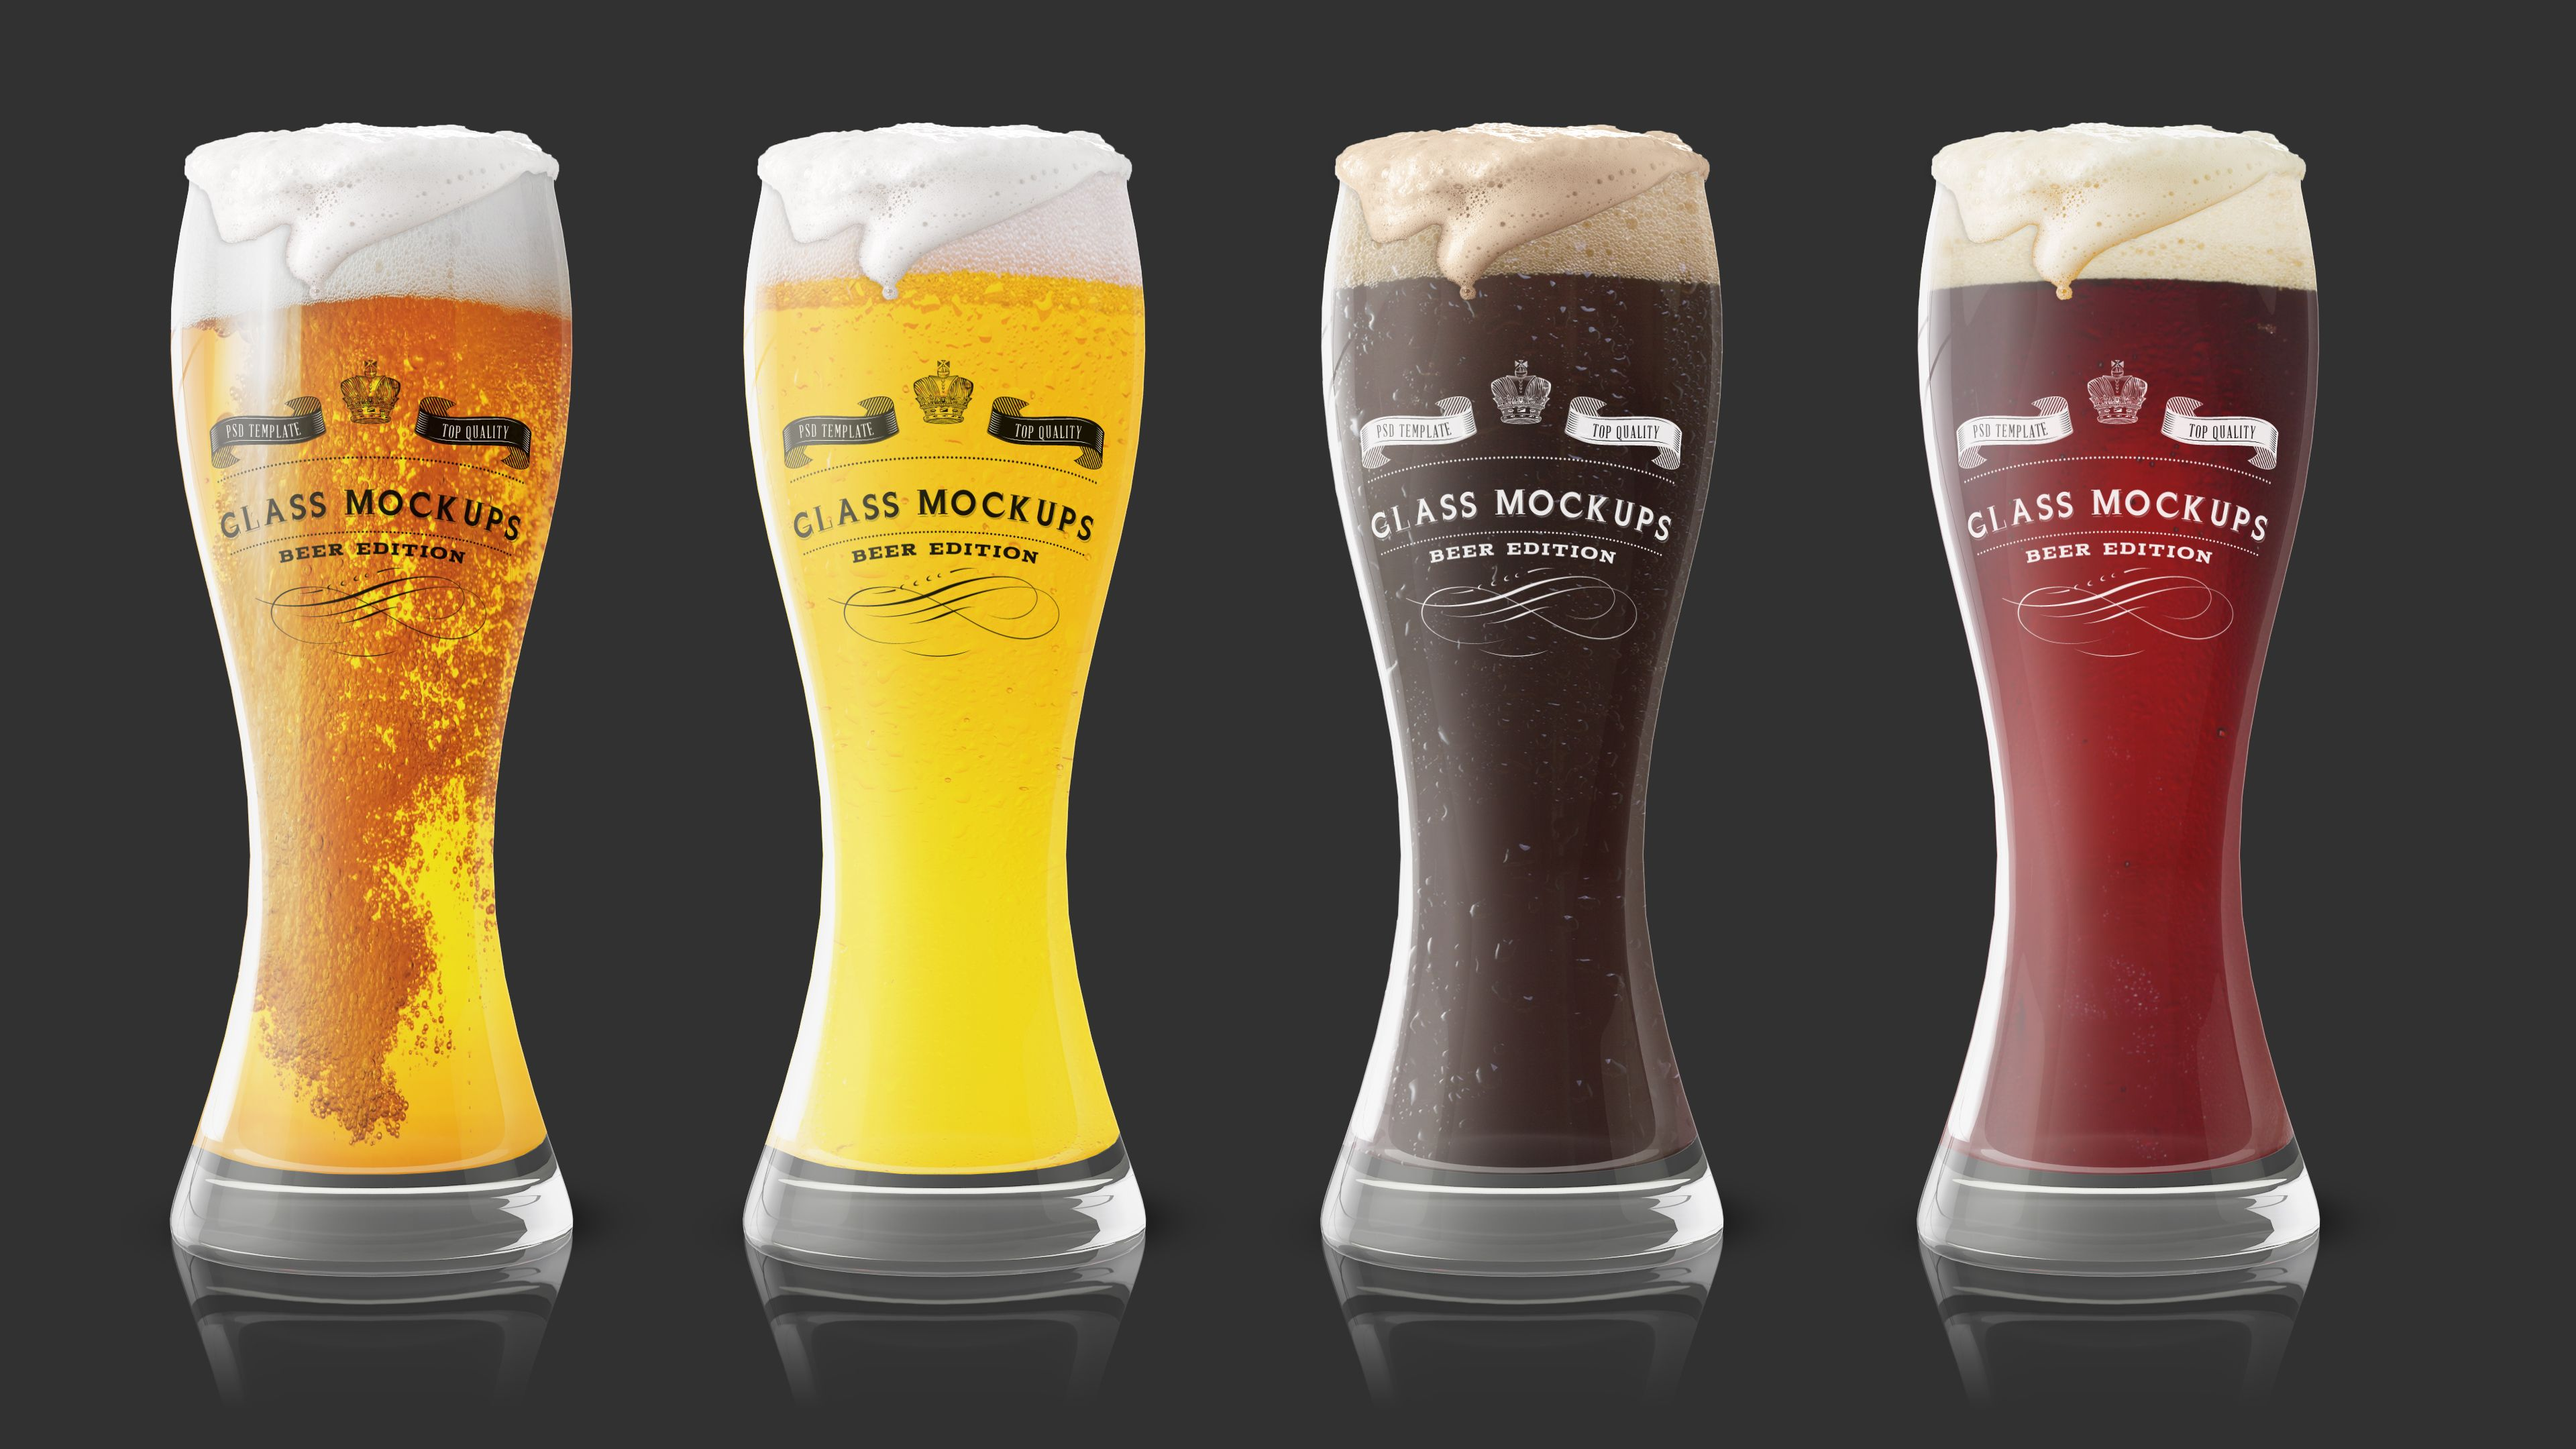 Glass Mockup Beer Glass Mockup 1 Mockup Glass Beer